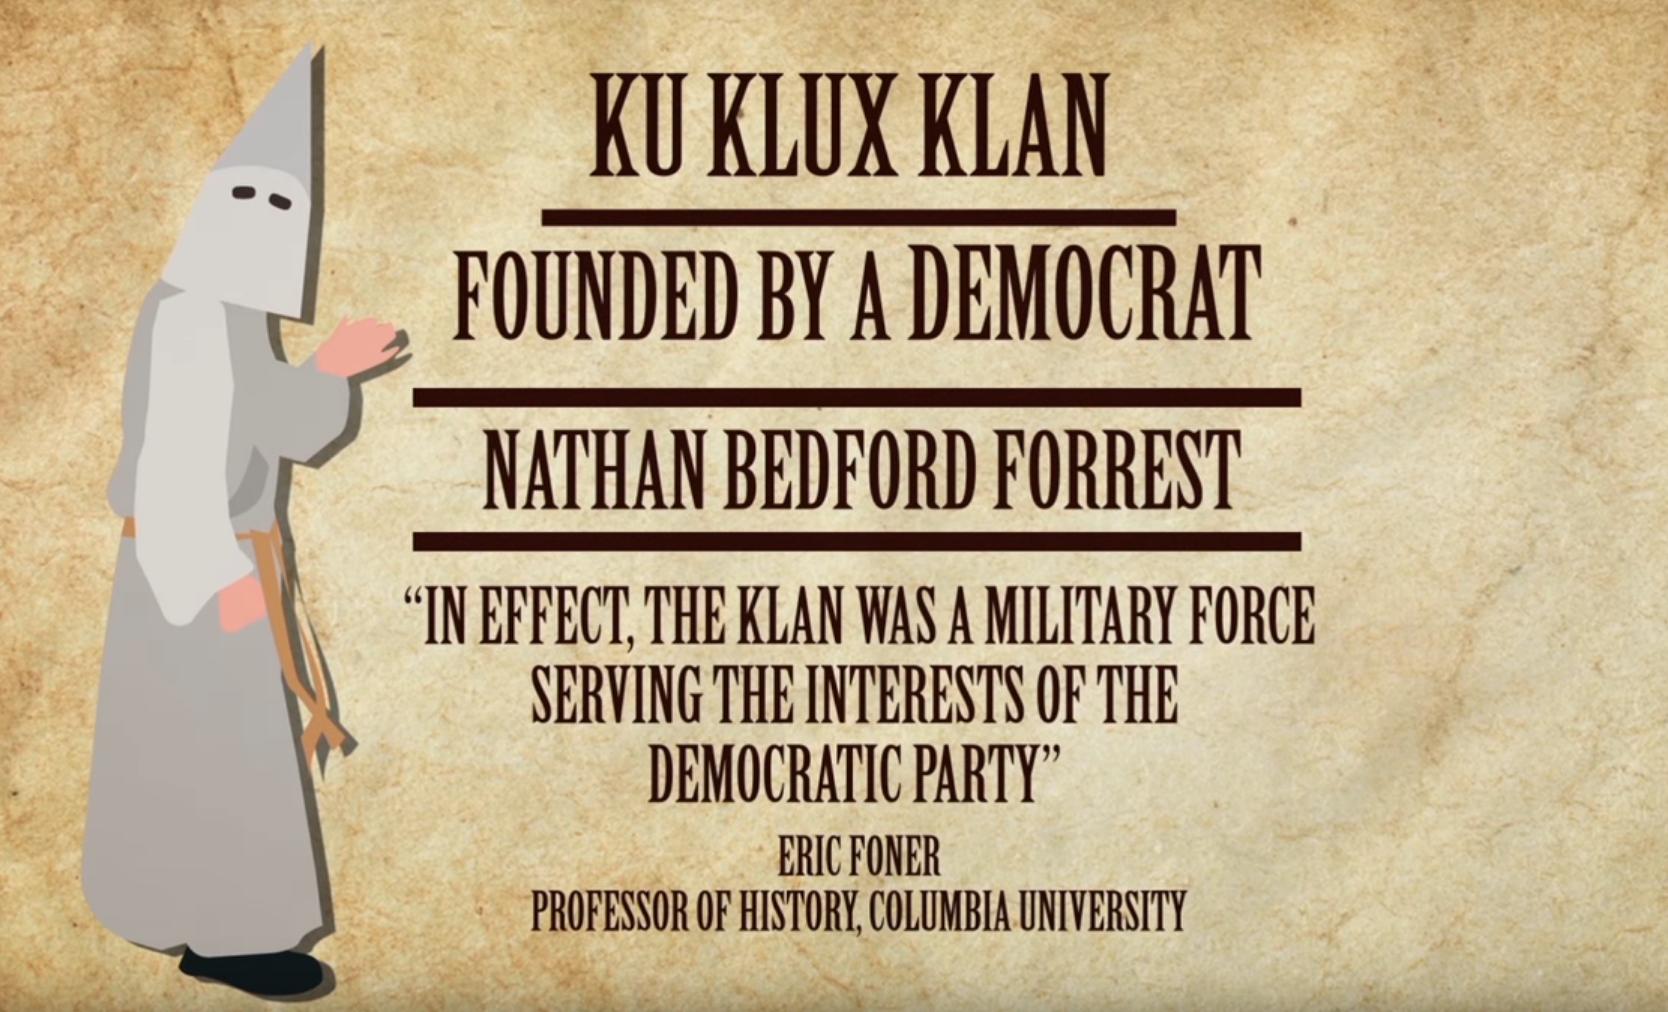 Democrats and the KKK at HoaxAndChange.com